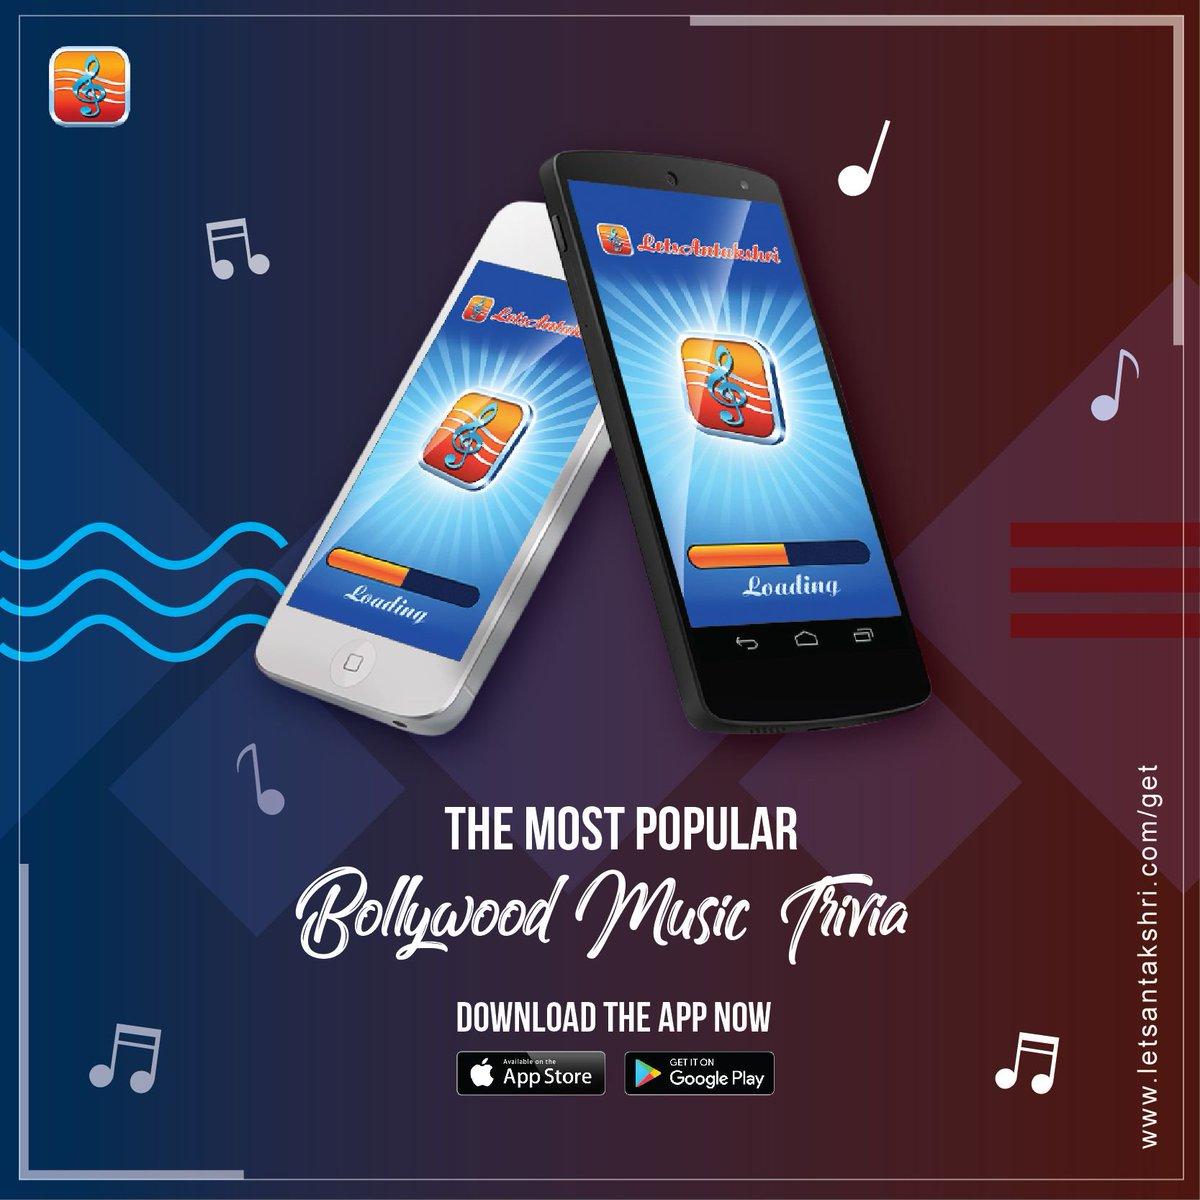 Letsantakshri On Twitter The Most Popular Bollywood Music Trivia